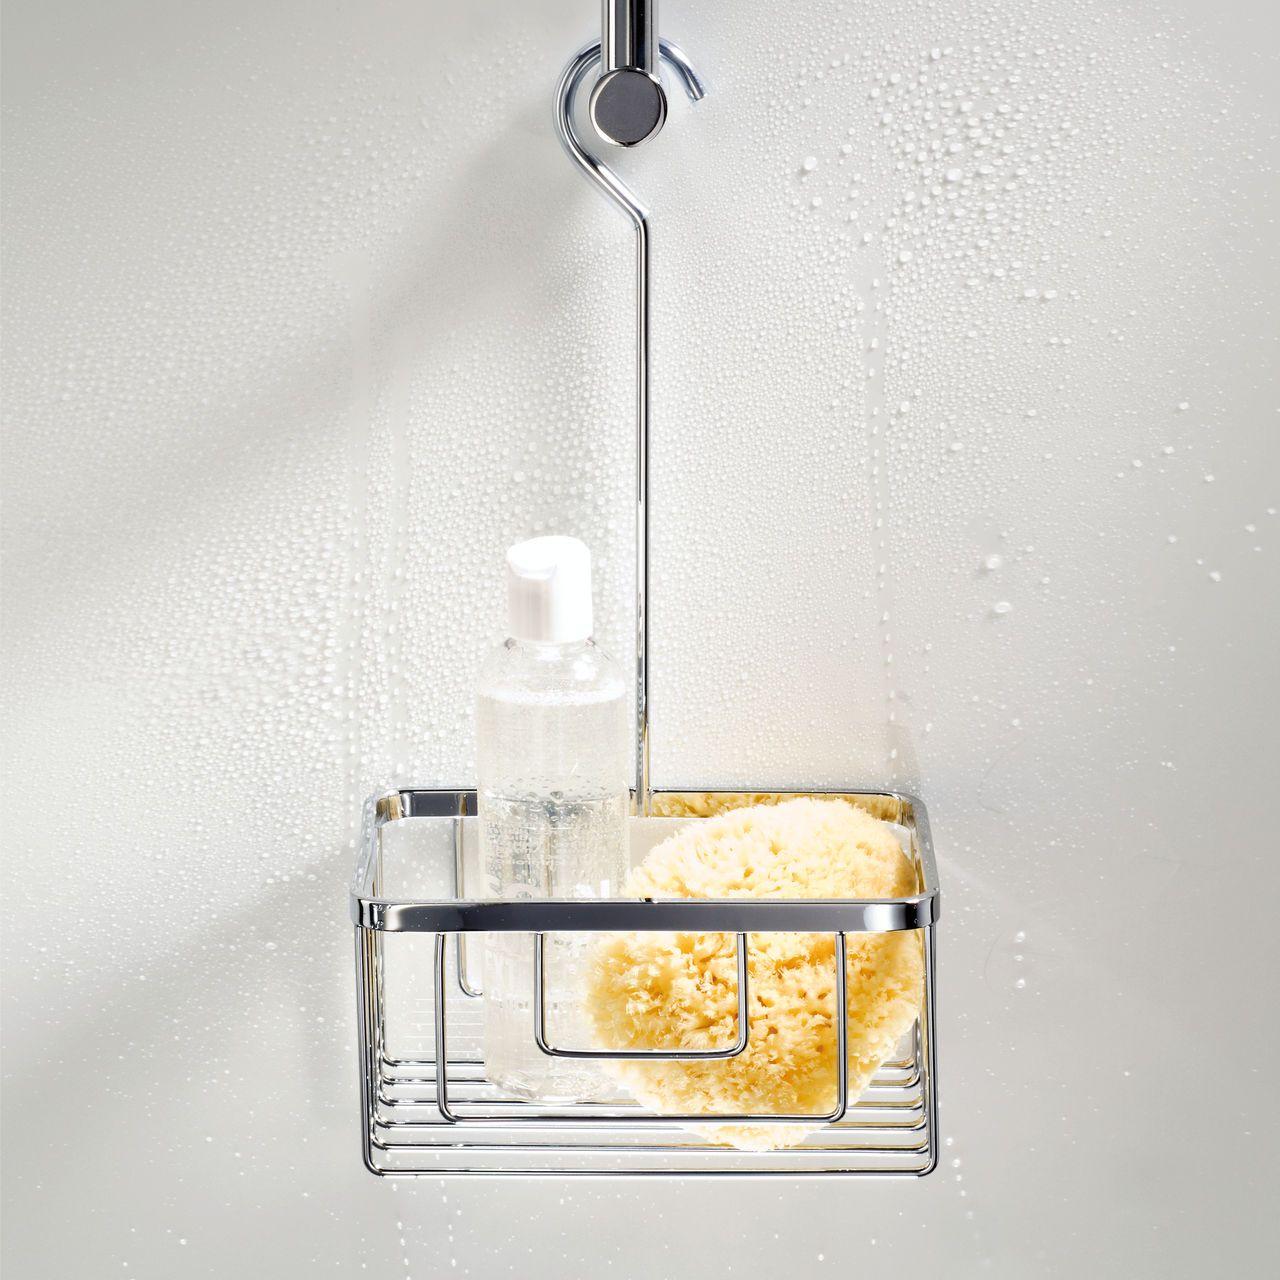 duschkorb zum aufh ngen bad wellness shower basket. Black Bedroom Furniture Sets. Home Design Ideas